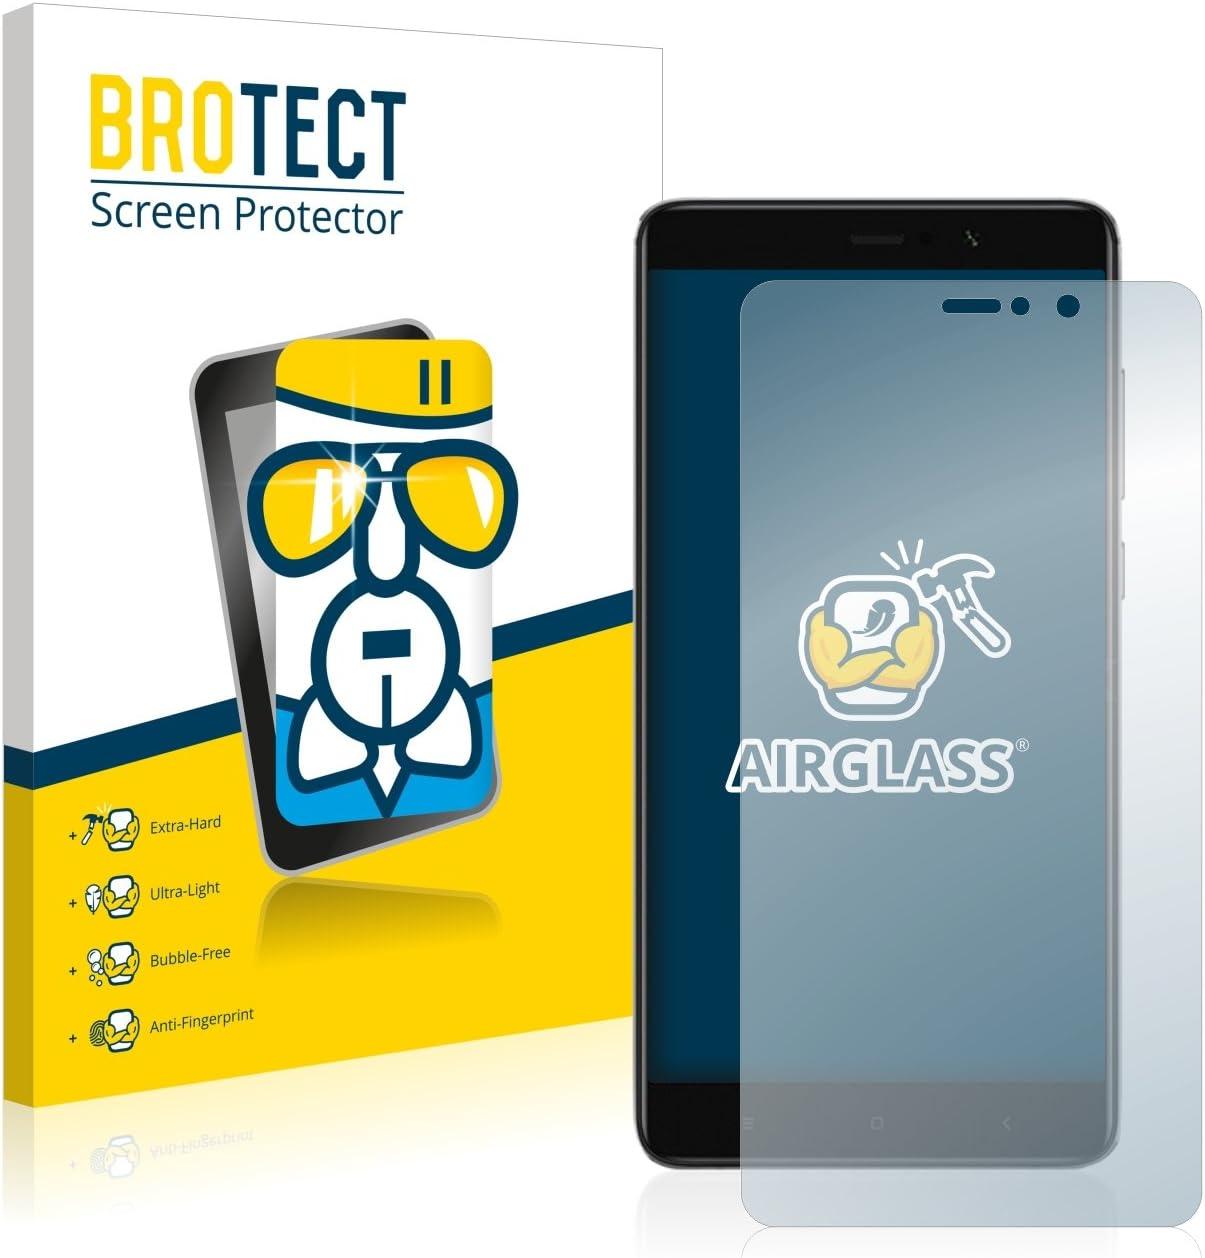 BROTECT Protector Pantalla Cristal Compatible con Xiaomi Mi 5S Plus Protector Pantalla Vidrio Dureza 9H AirGlass